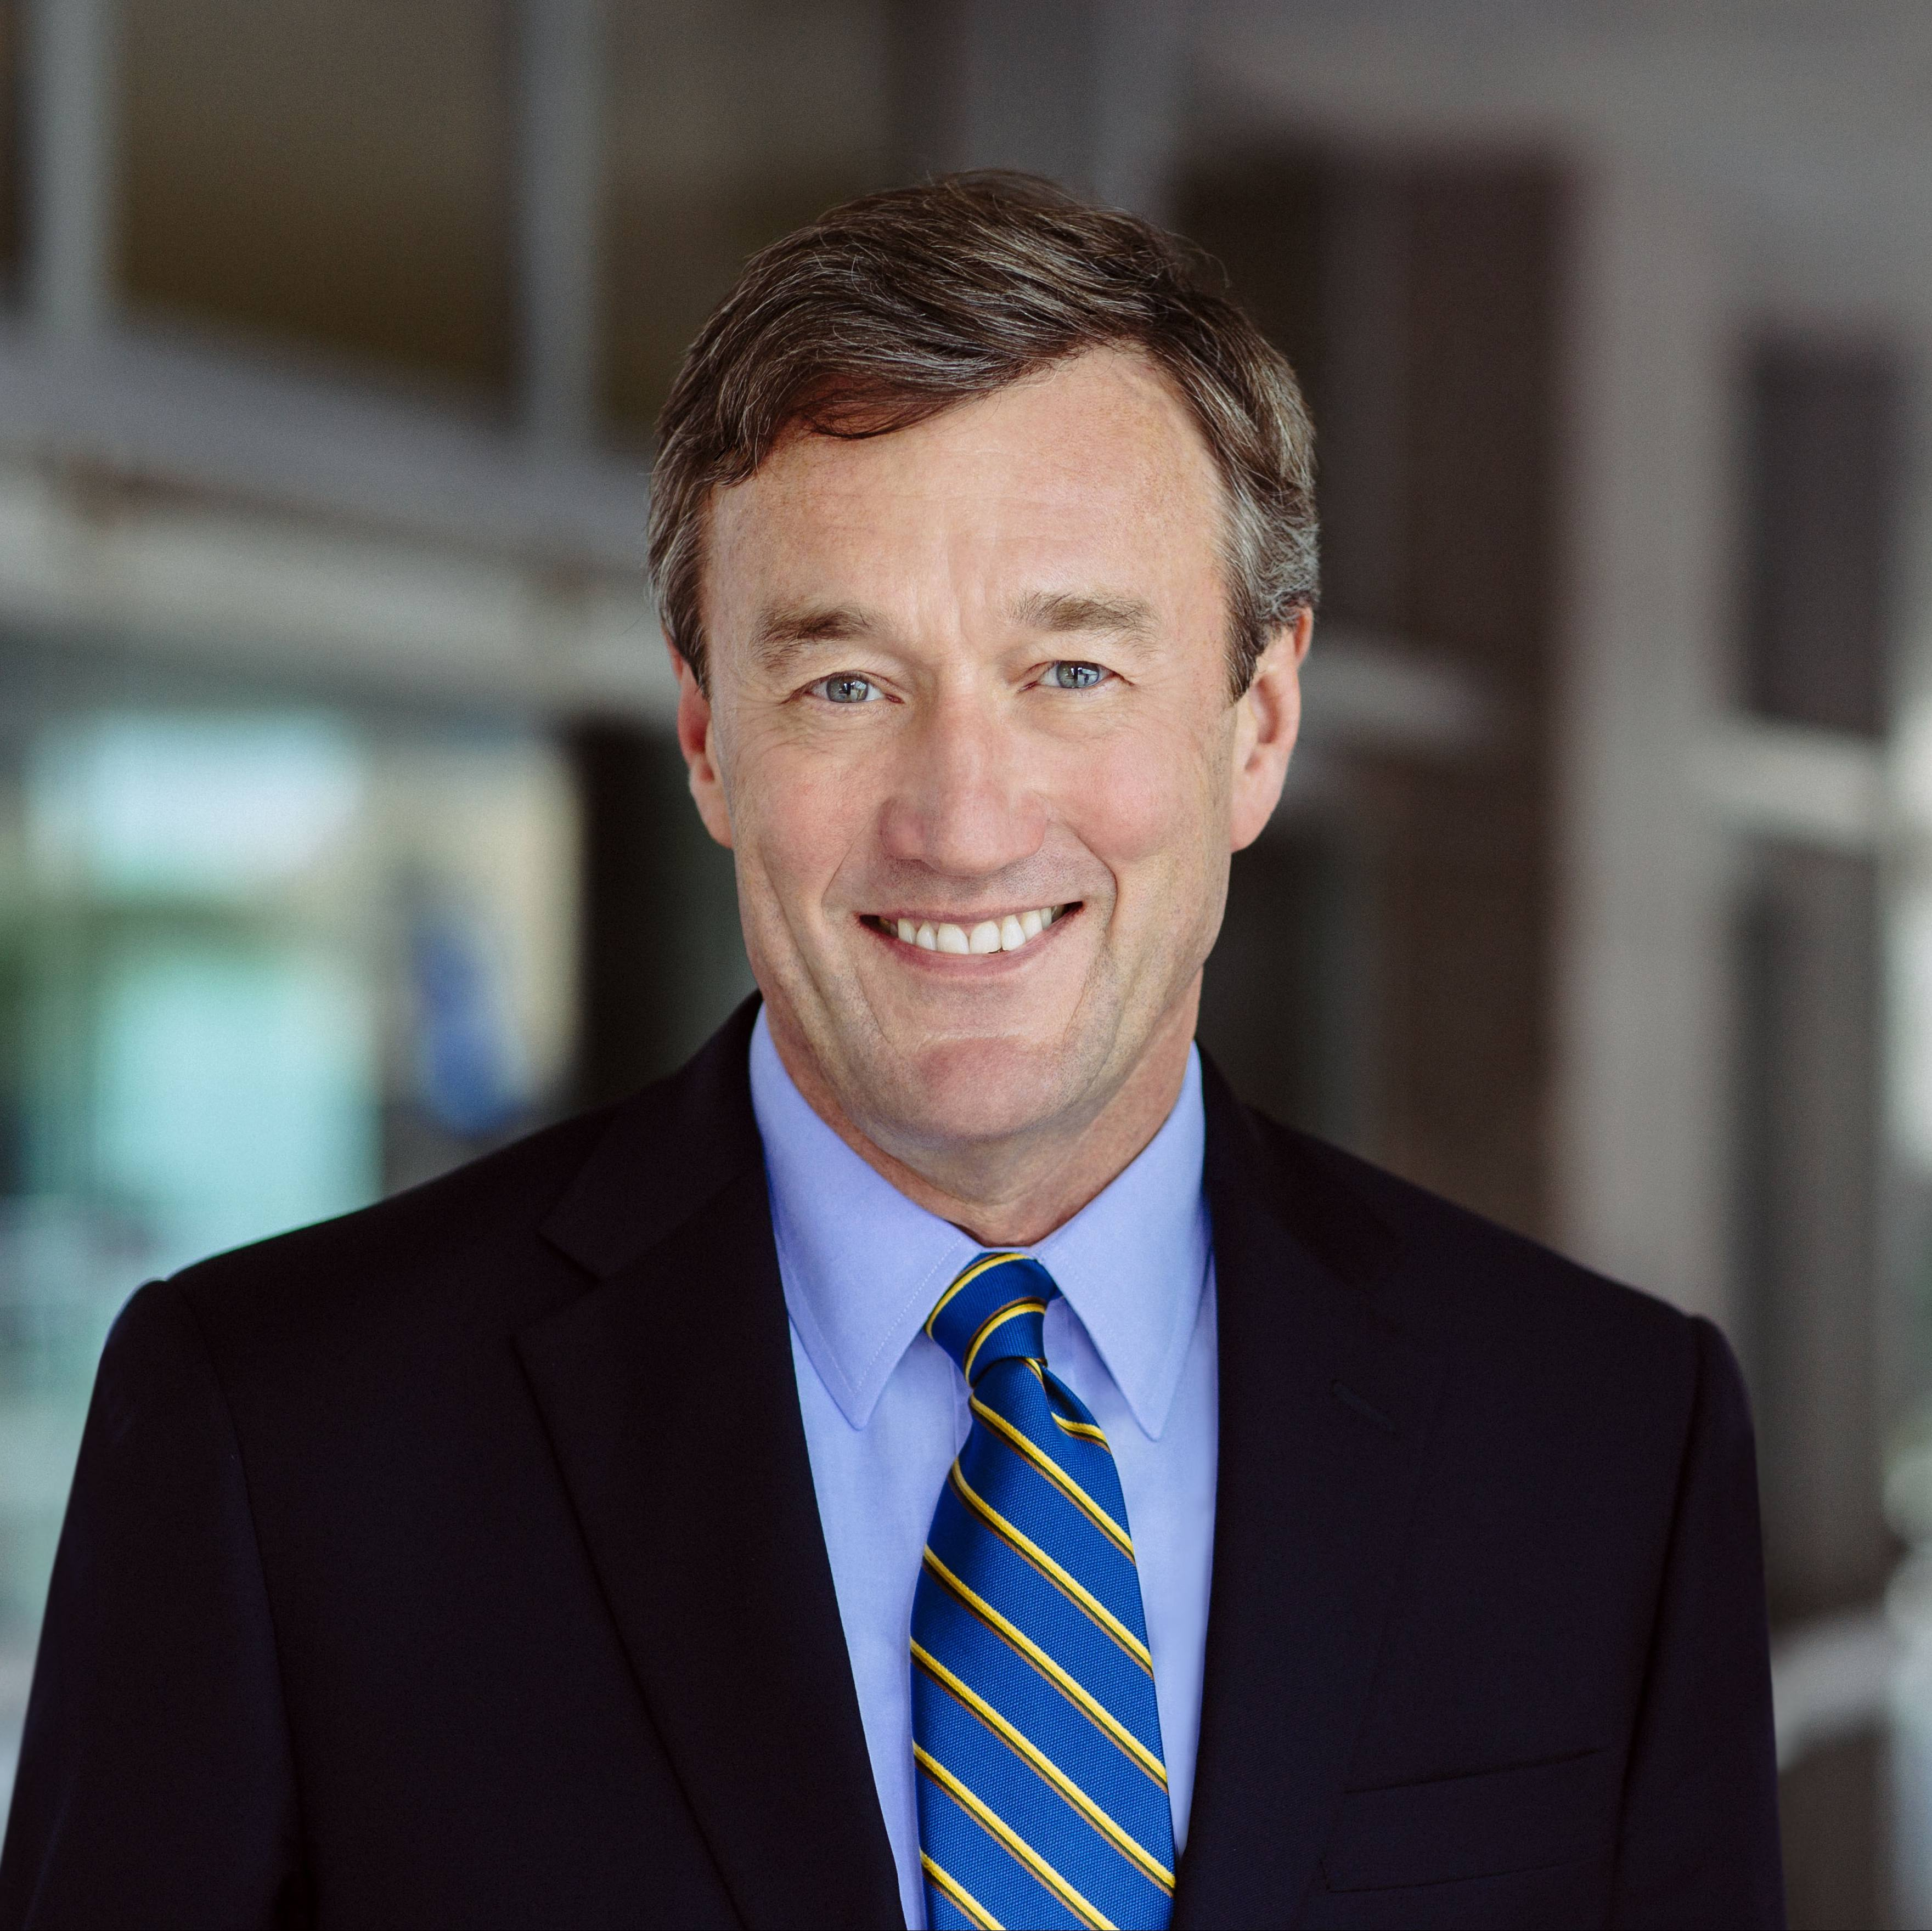 photo of John Noseworthy, M.D.